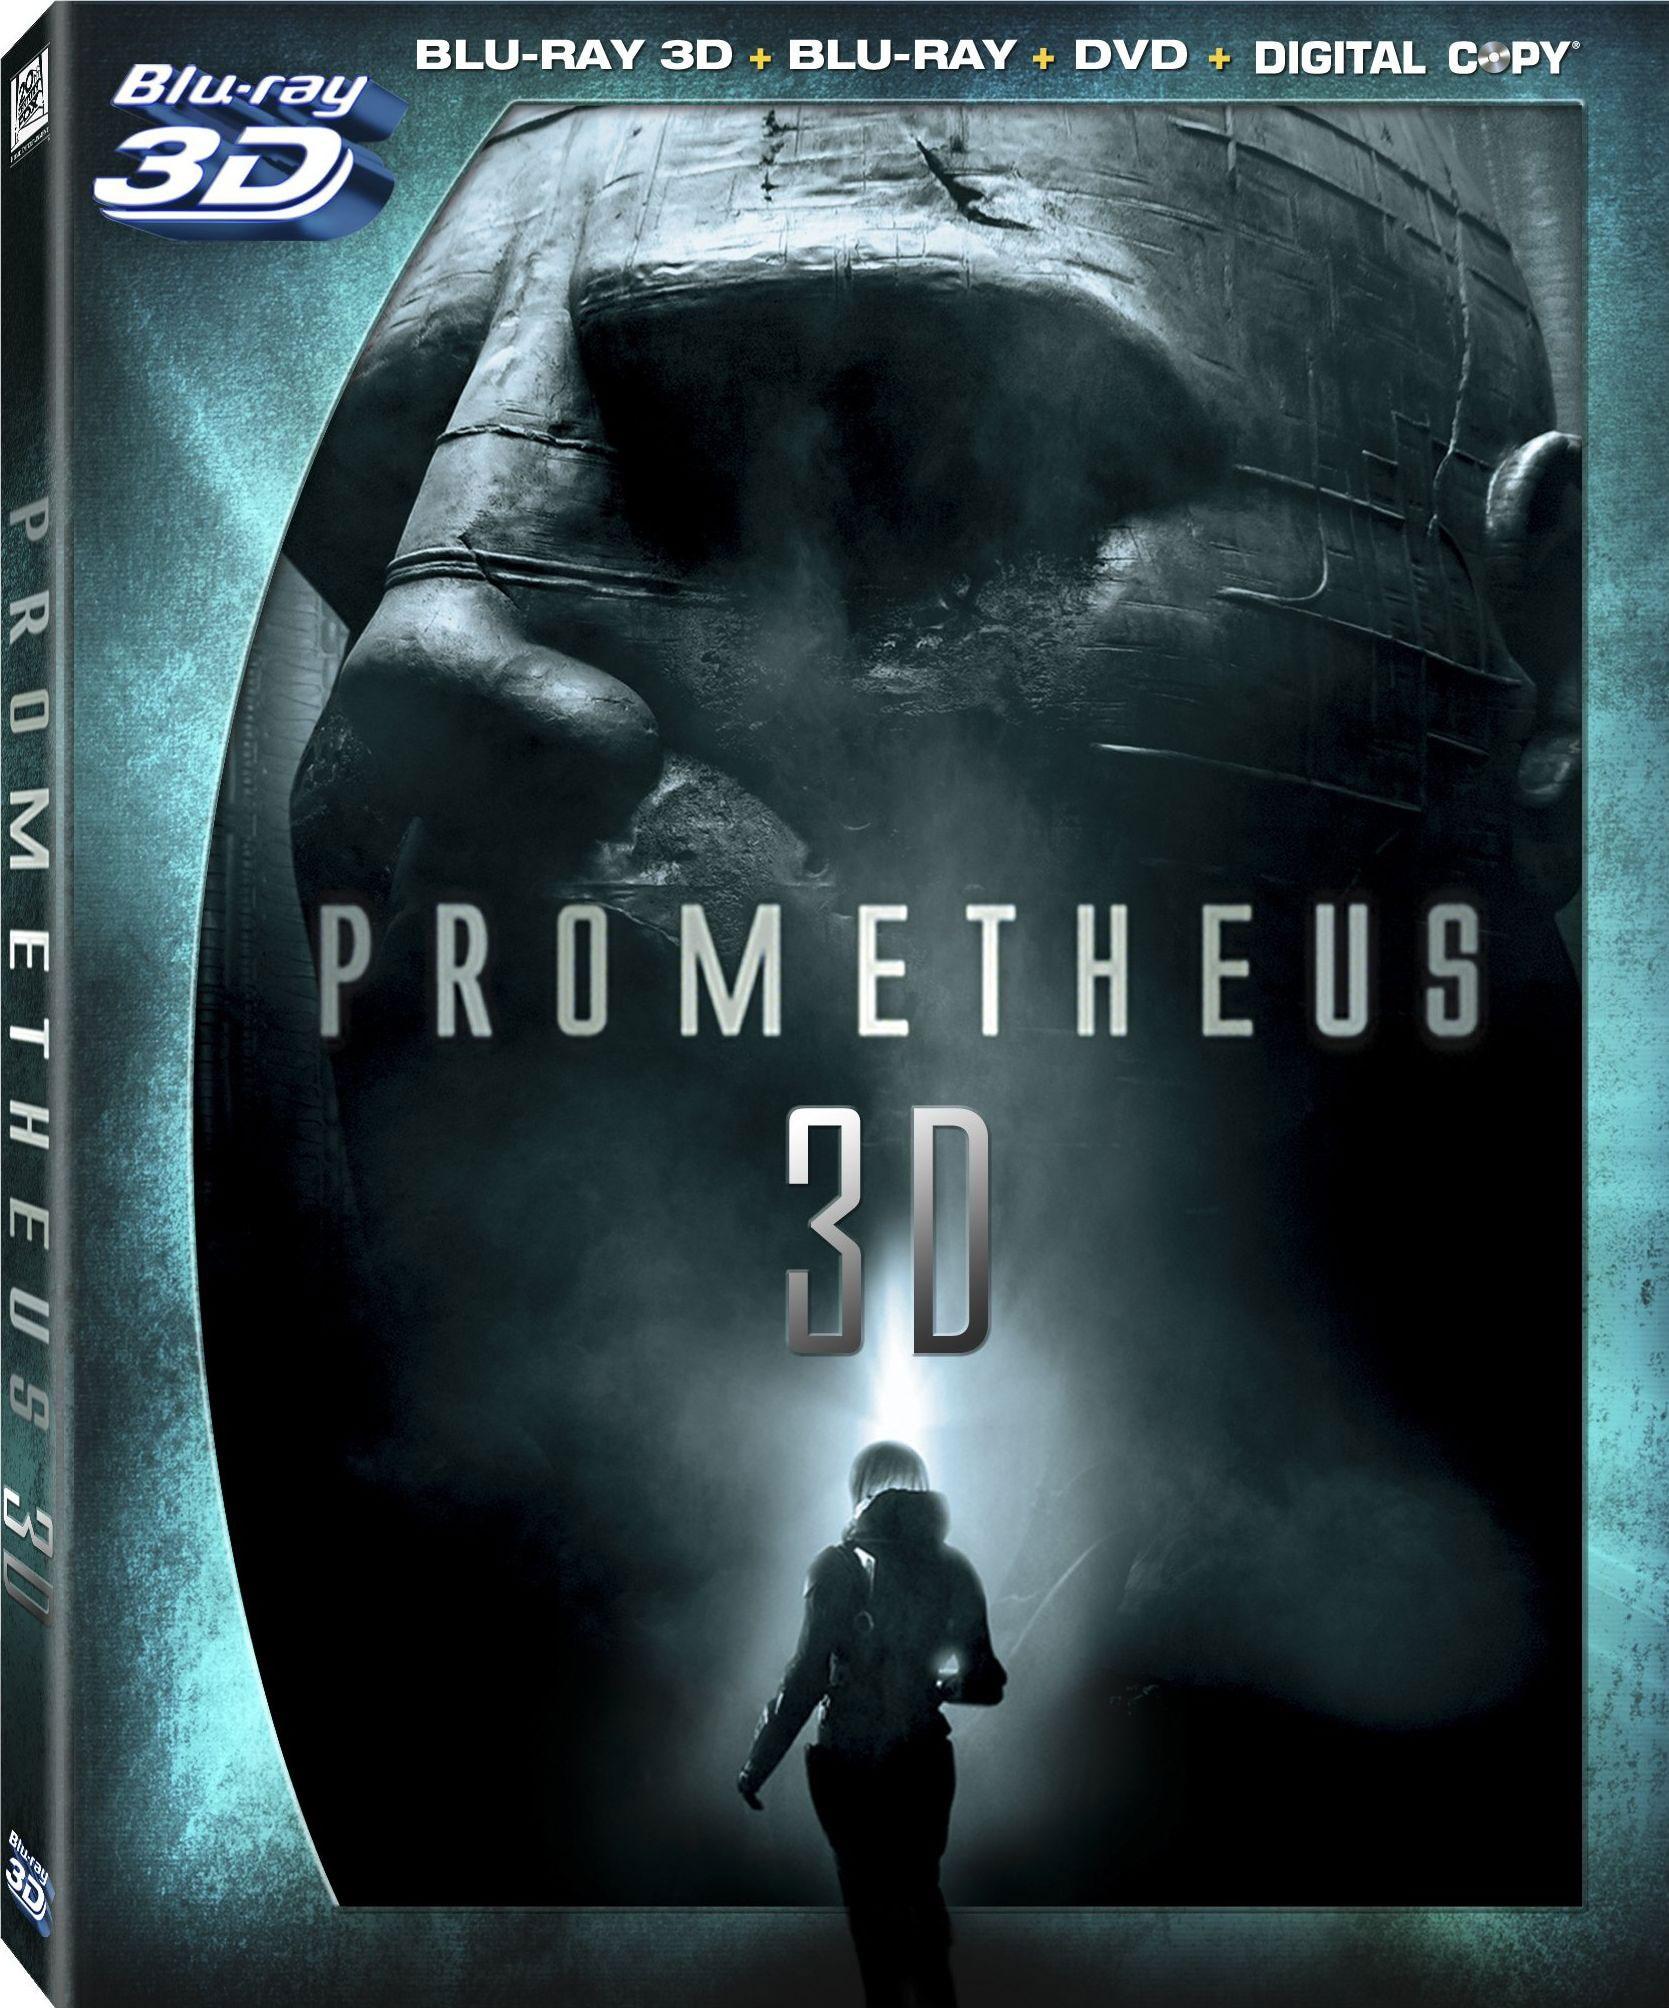 Prometheus 3D (Blu-ray 3D / Blu-ray / DVD)